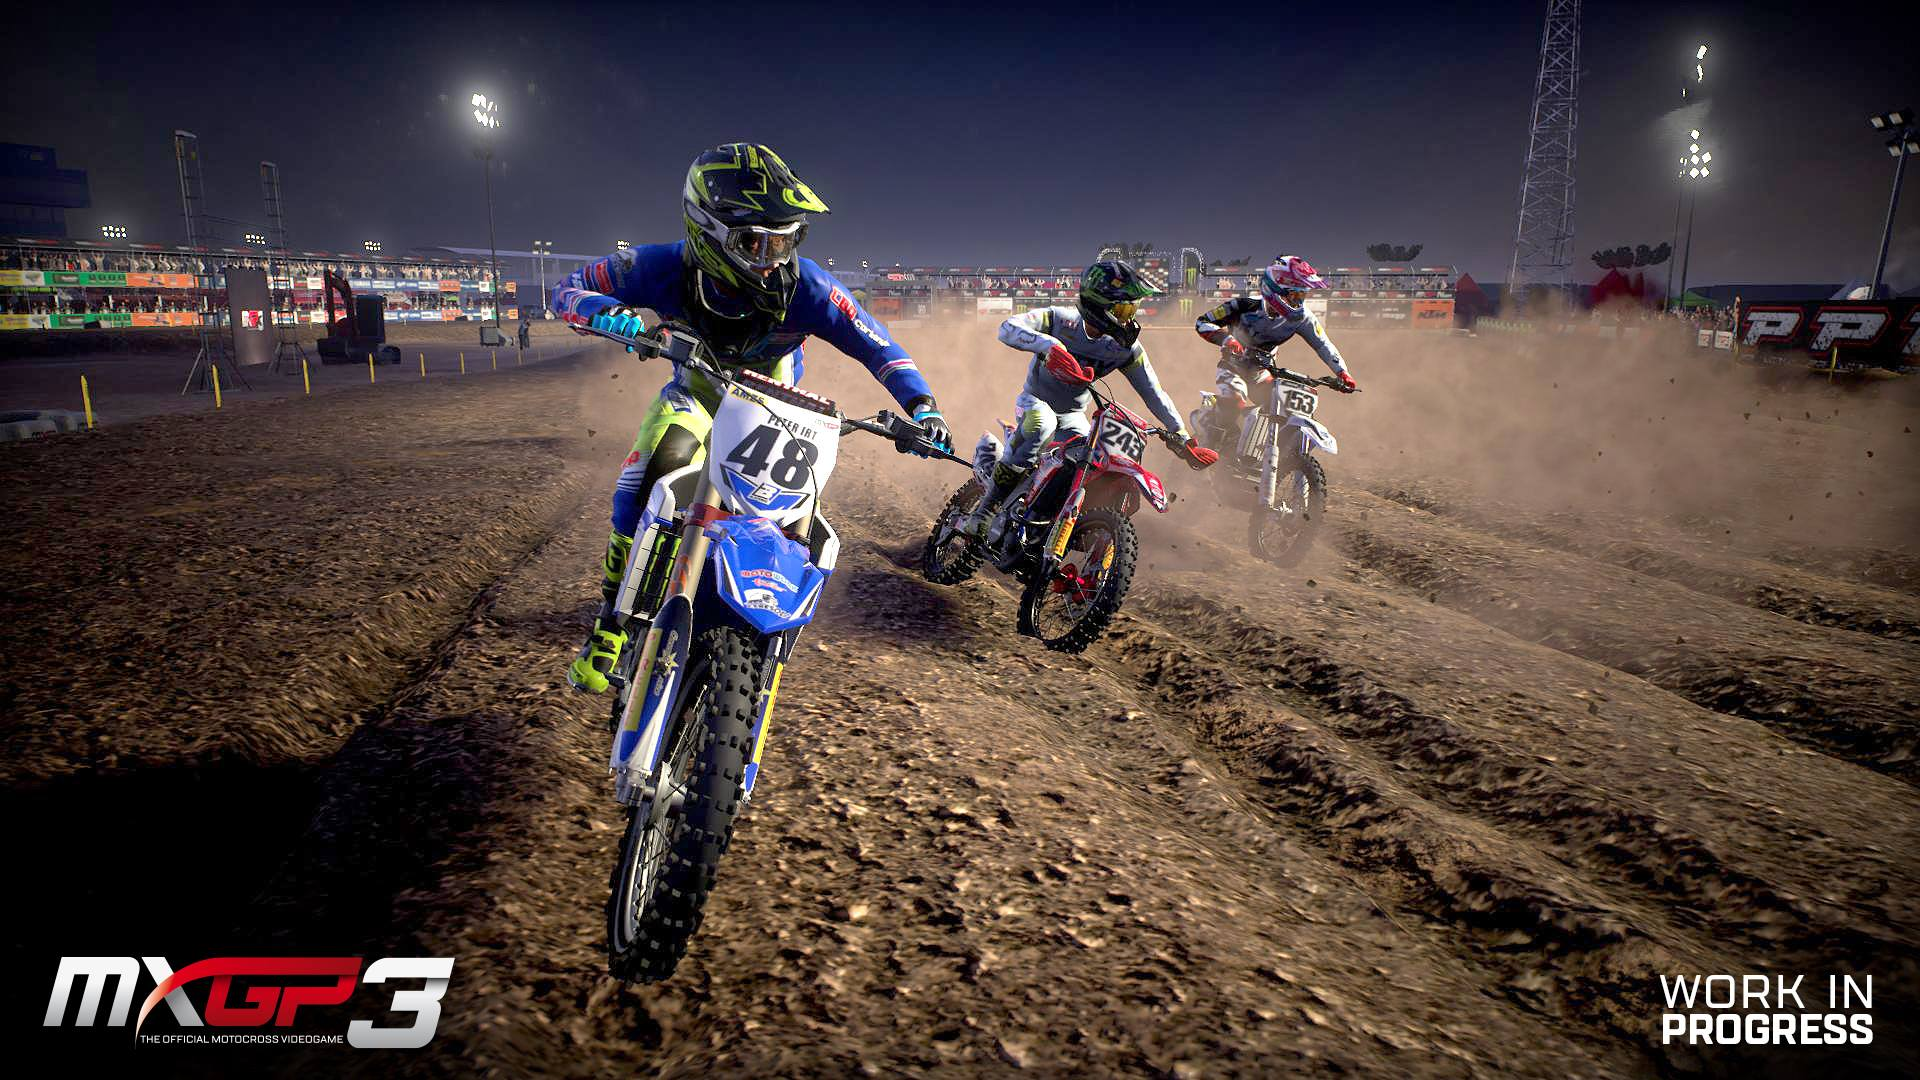 MXGP 3 dirt racing